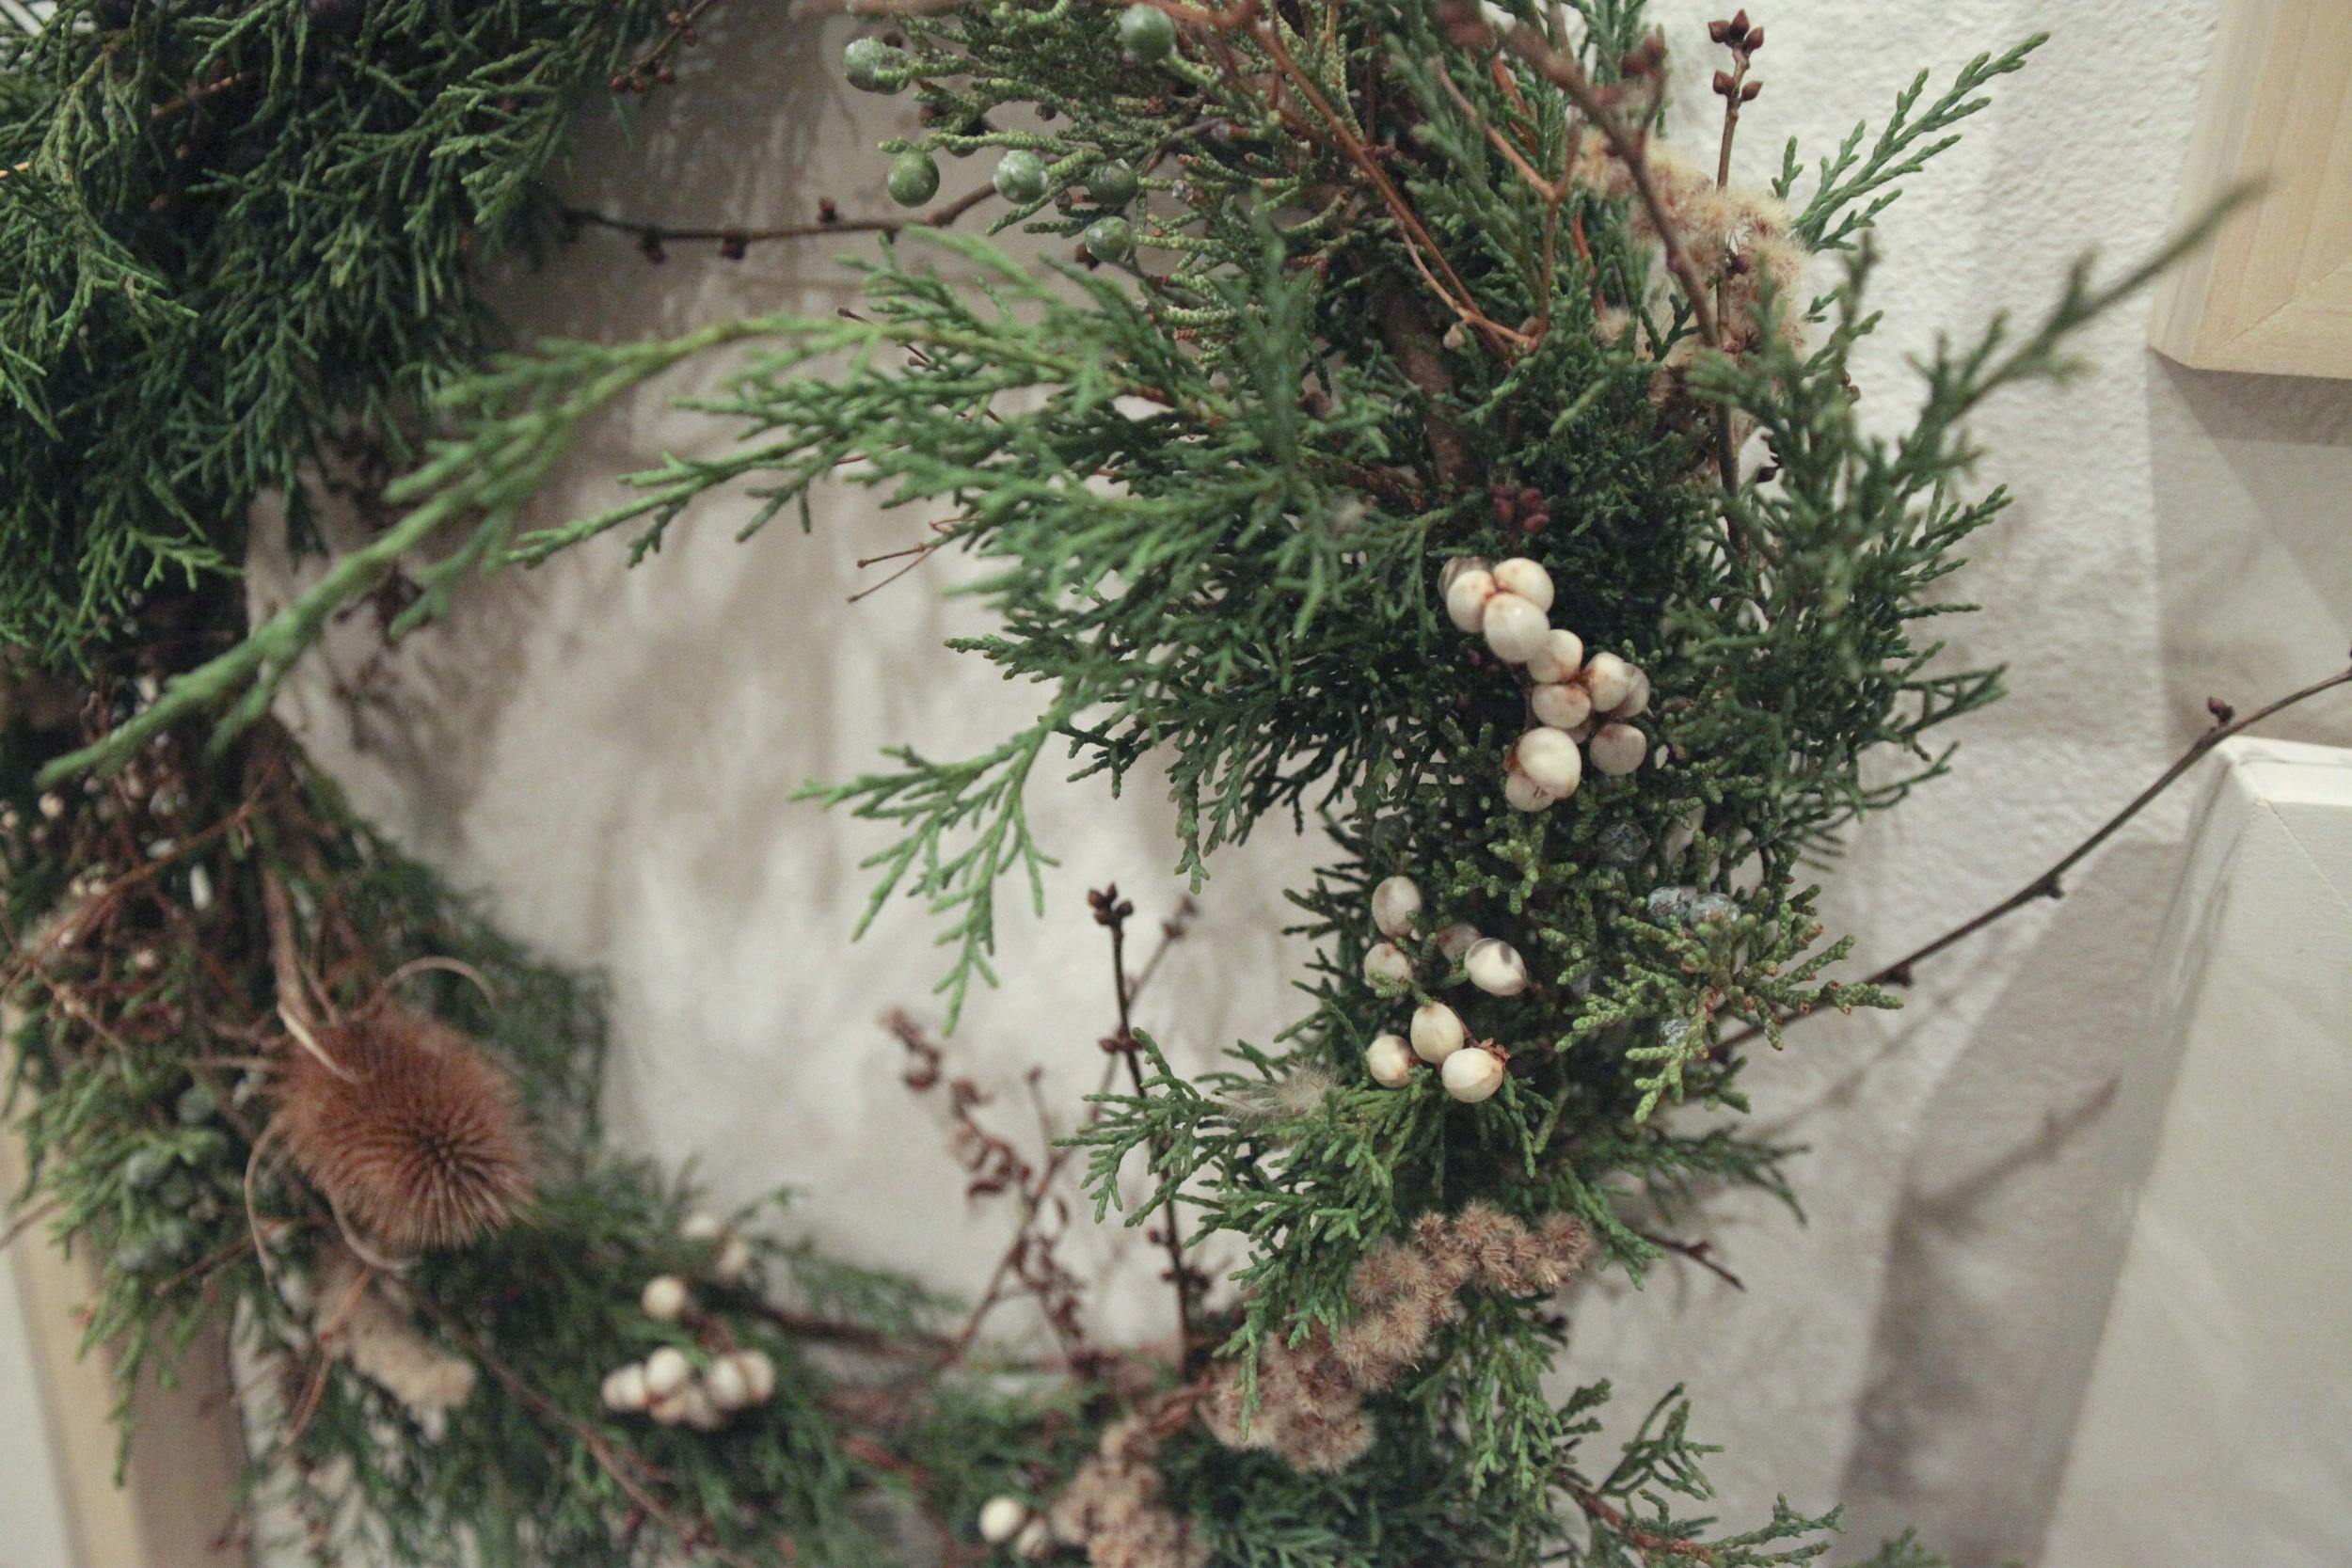 o-workshop-2014-wreath-details_1.jpg